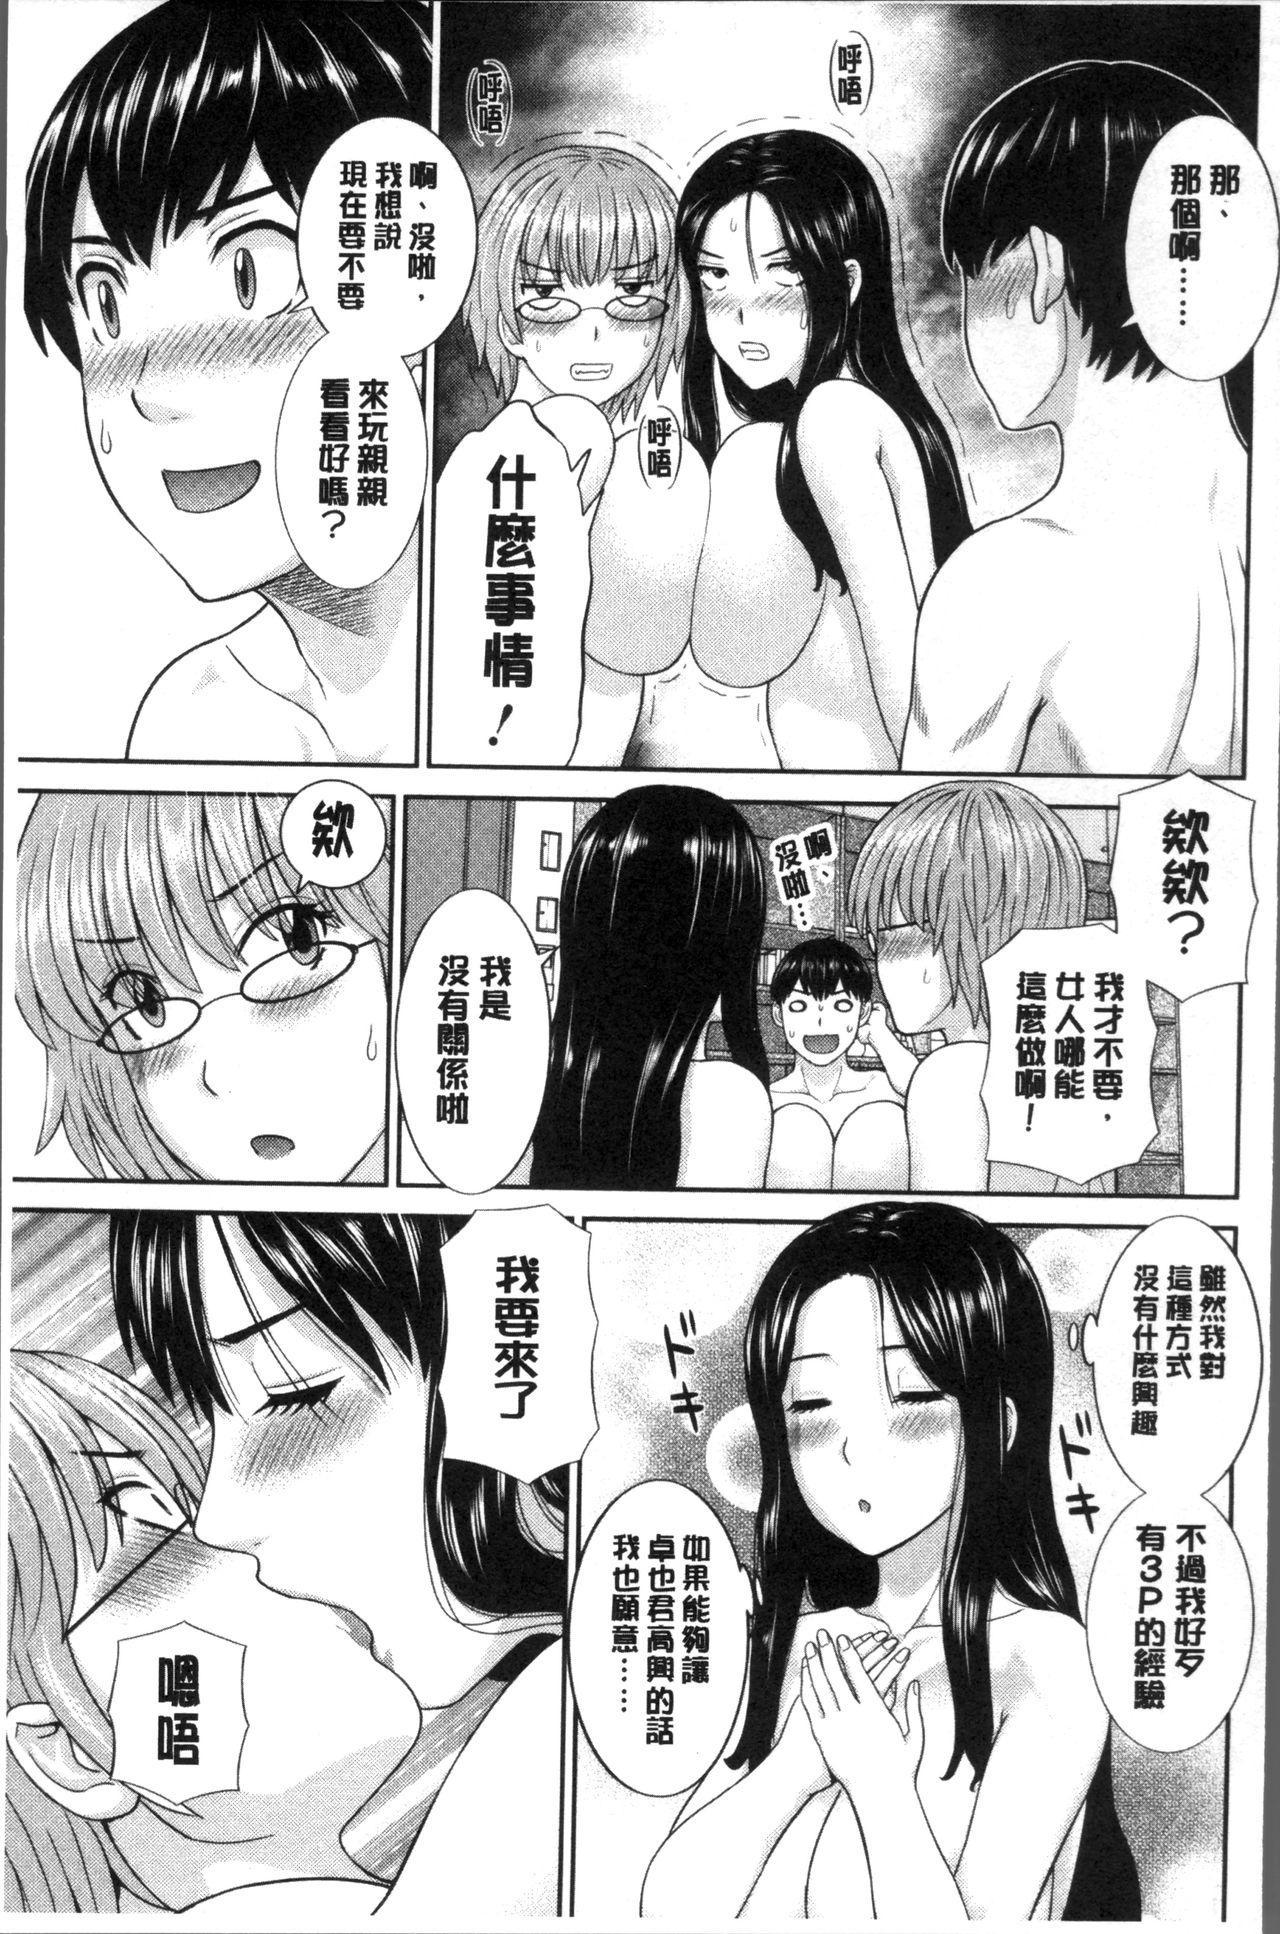 [Kawamori Misaki] Innyuu Shufu no Futei Ganbou - Oku-san to Kanojo to 2 | 淫乳主婦的不貞願望 和人妻也和女友❤2 [Chinese] 106